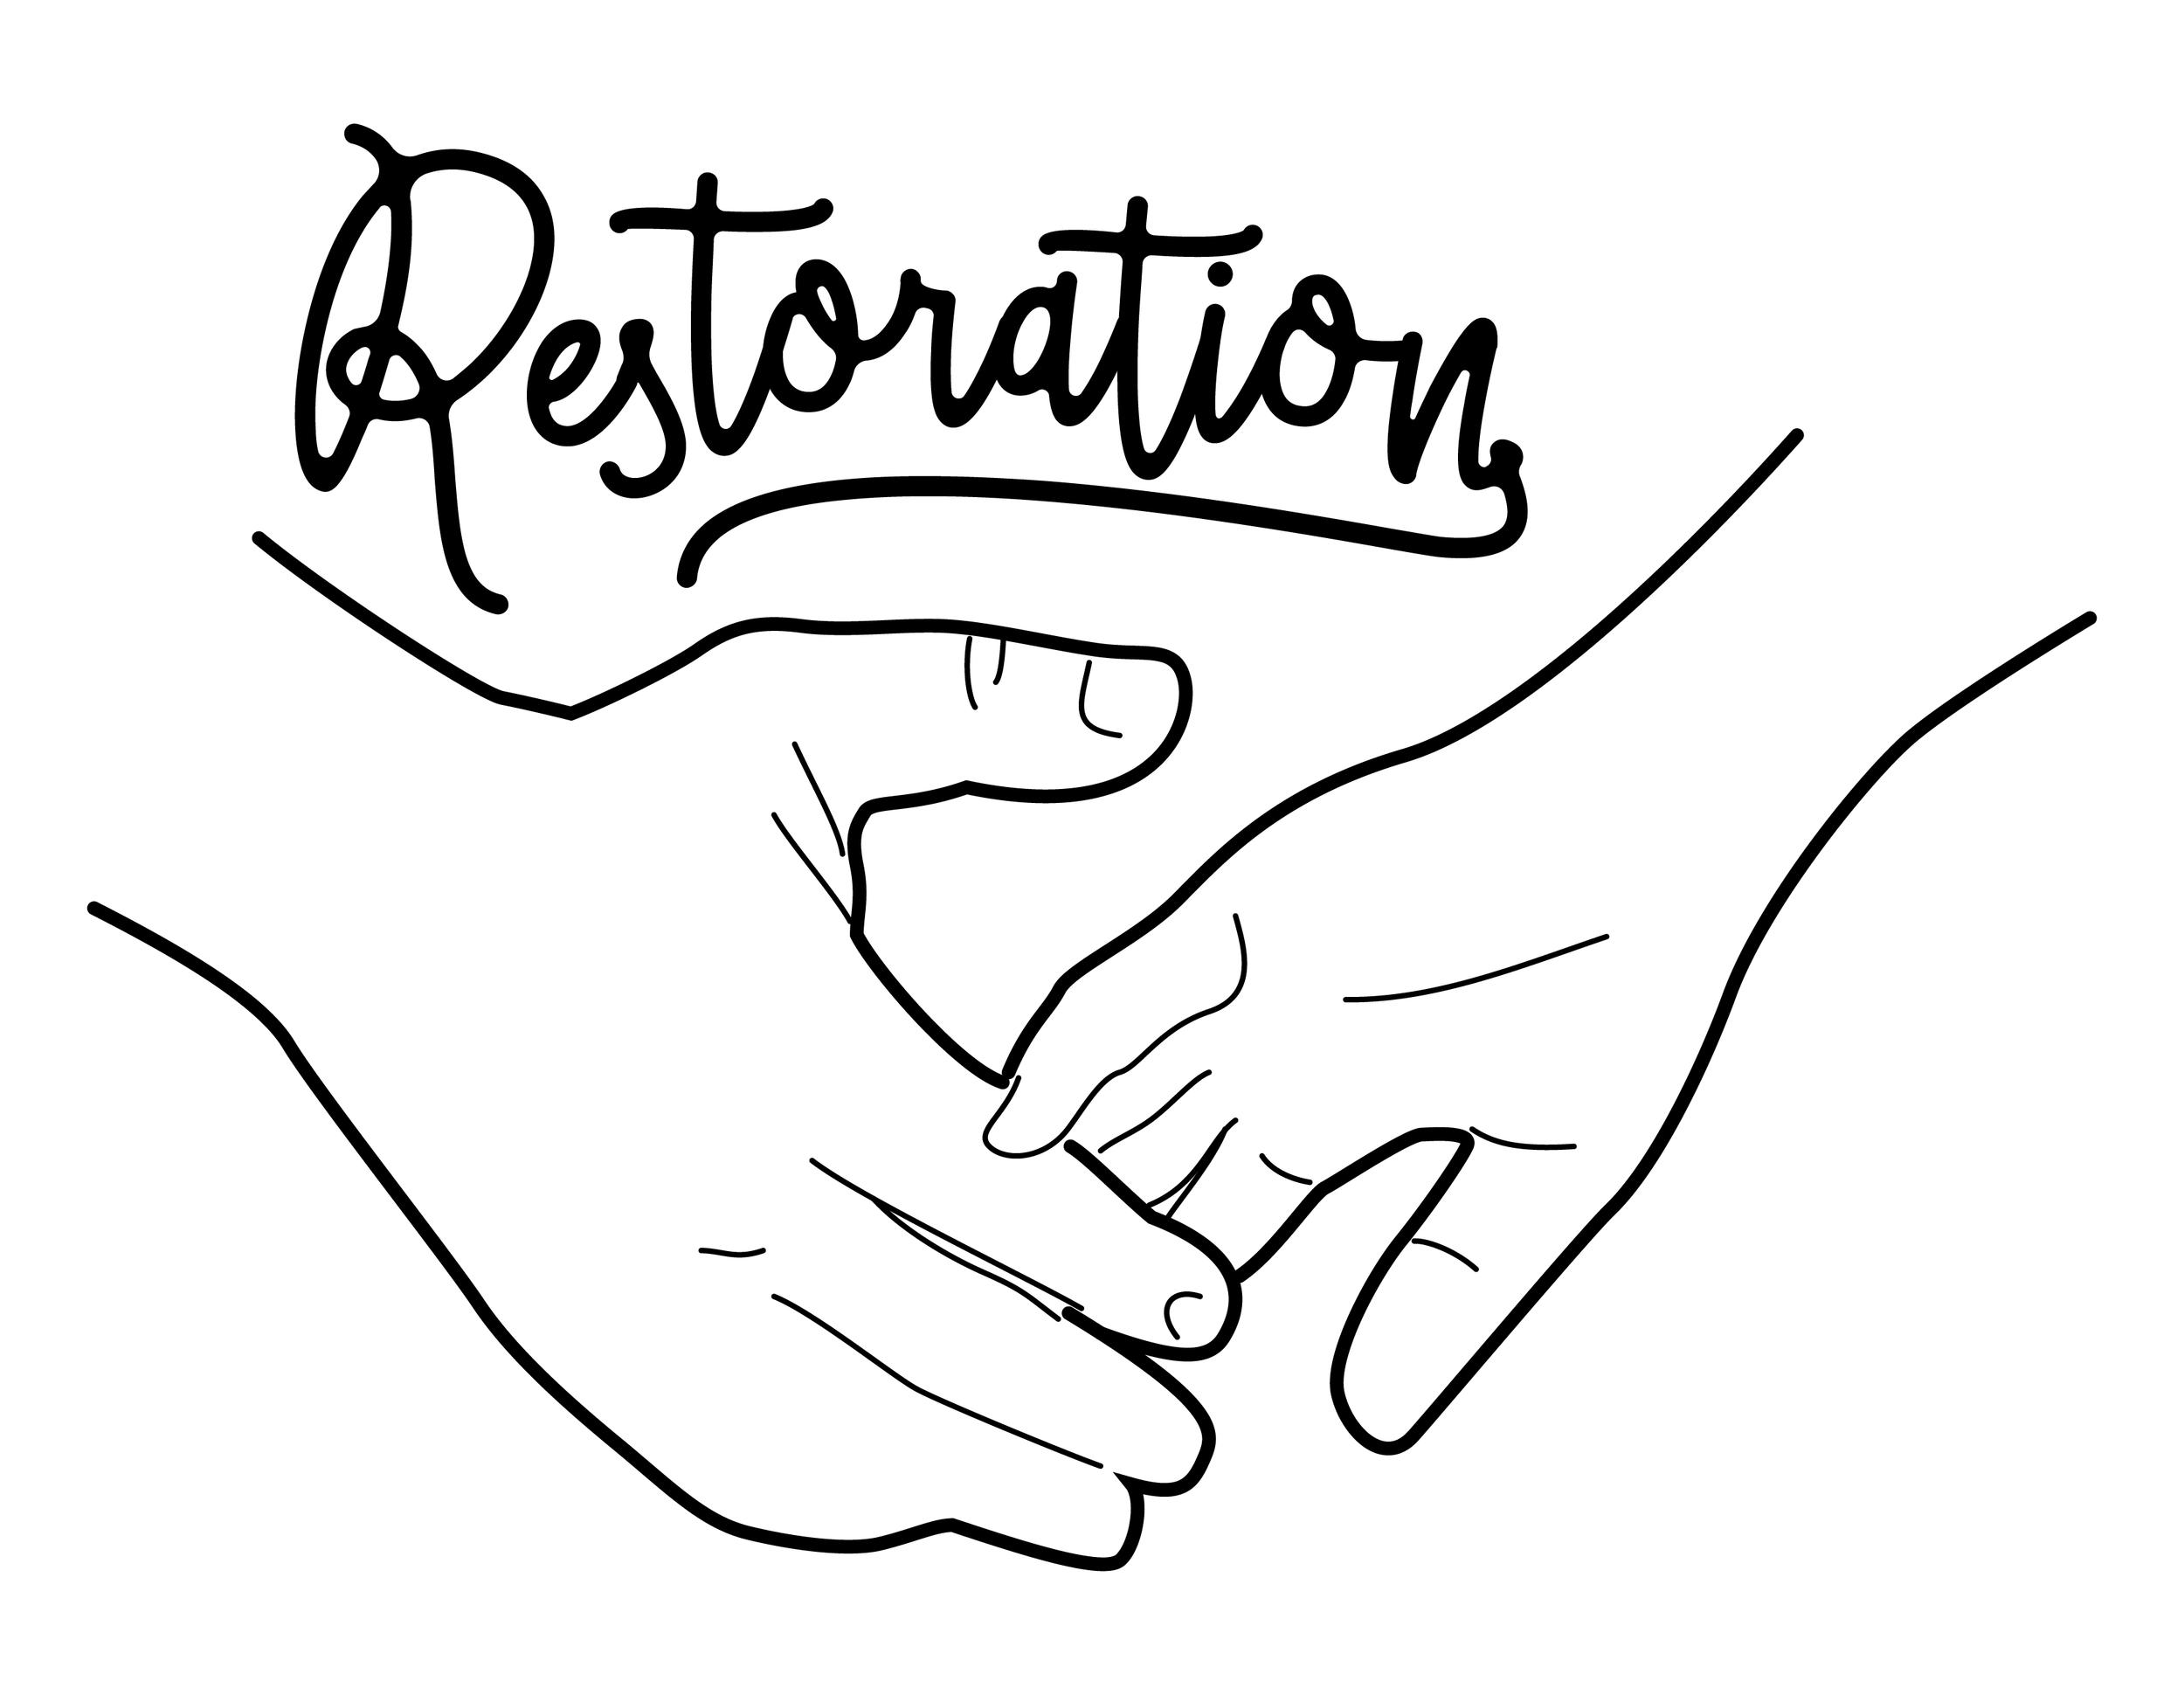 Gospel-Restoration-01.png